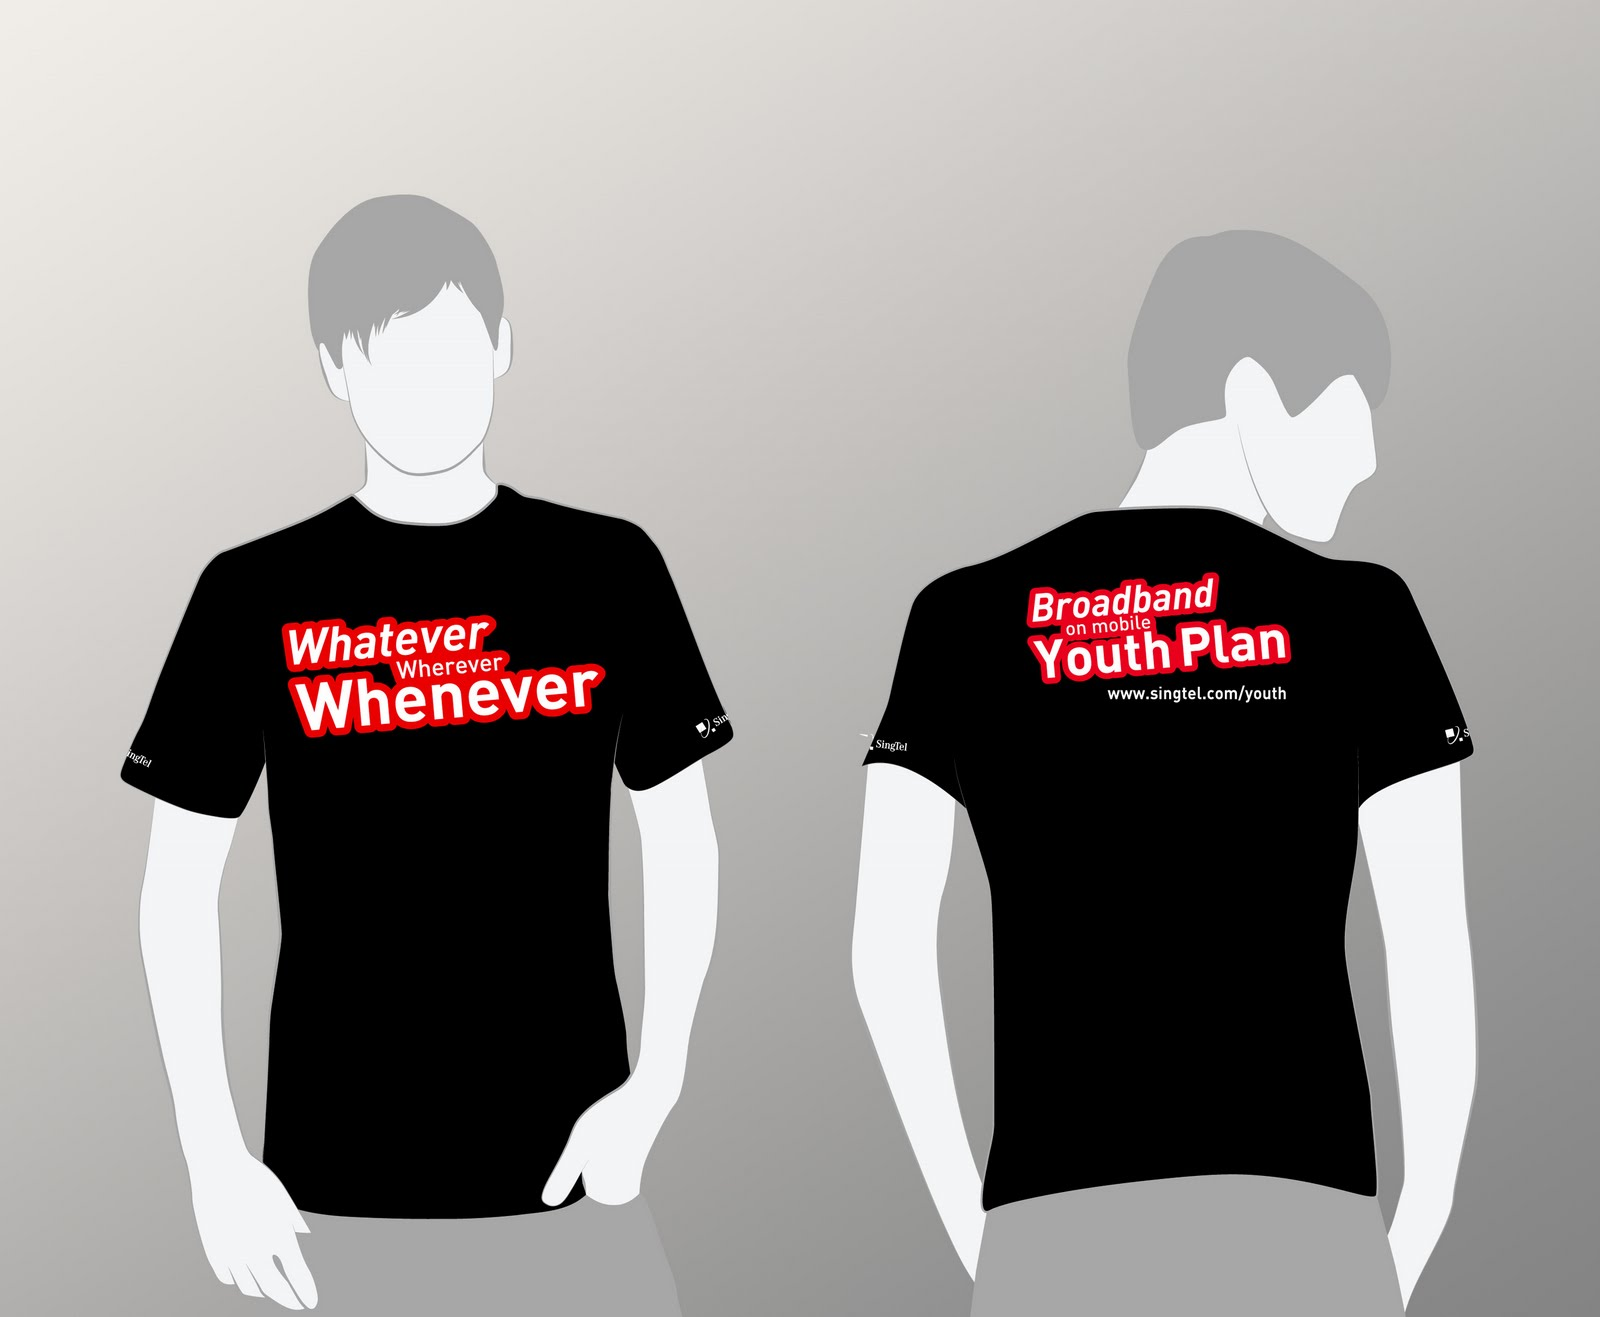 T shirt design queenstown - Singtel Promo Tees For Whatever Wherever Whenever